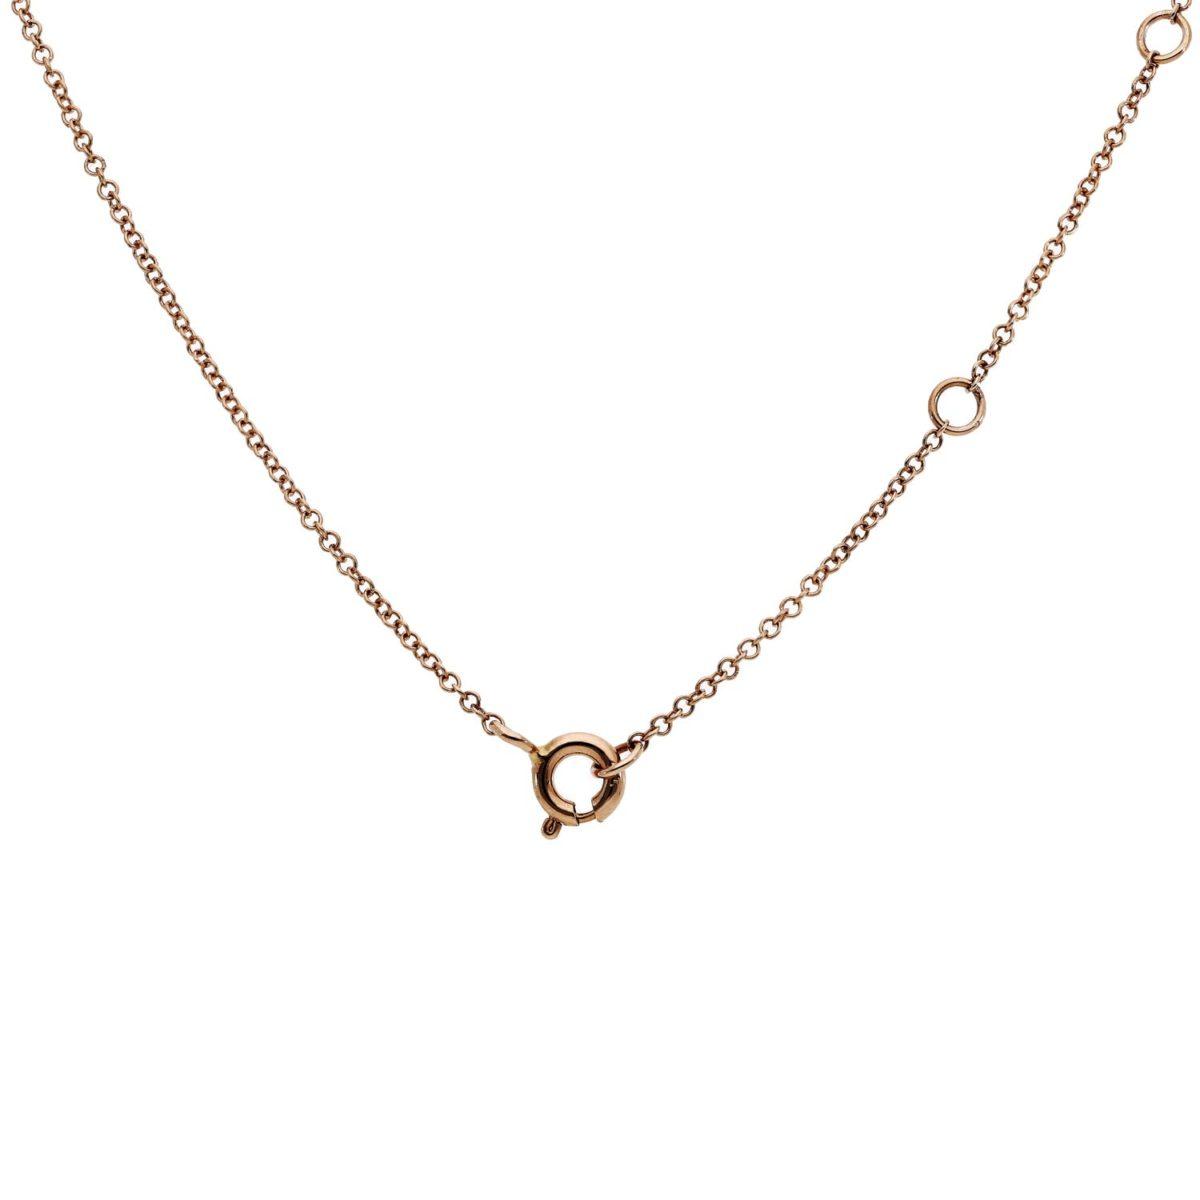 Diamond NecklaceStyle #: MK-813807